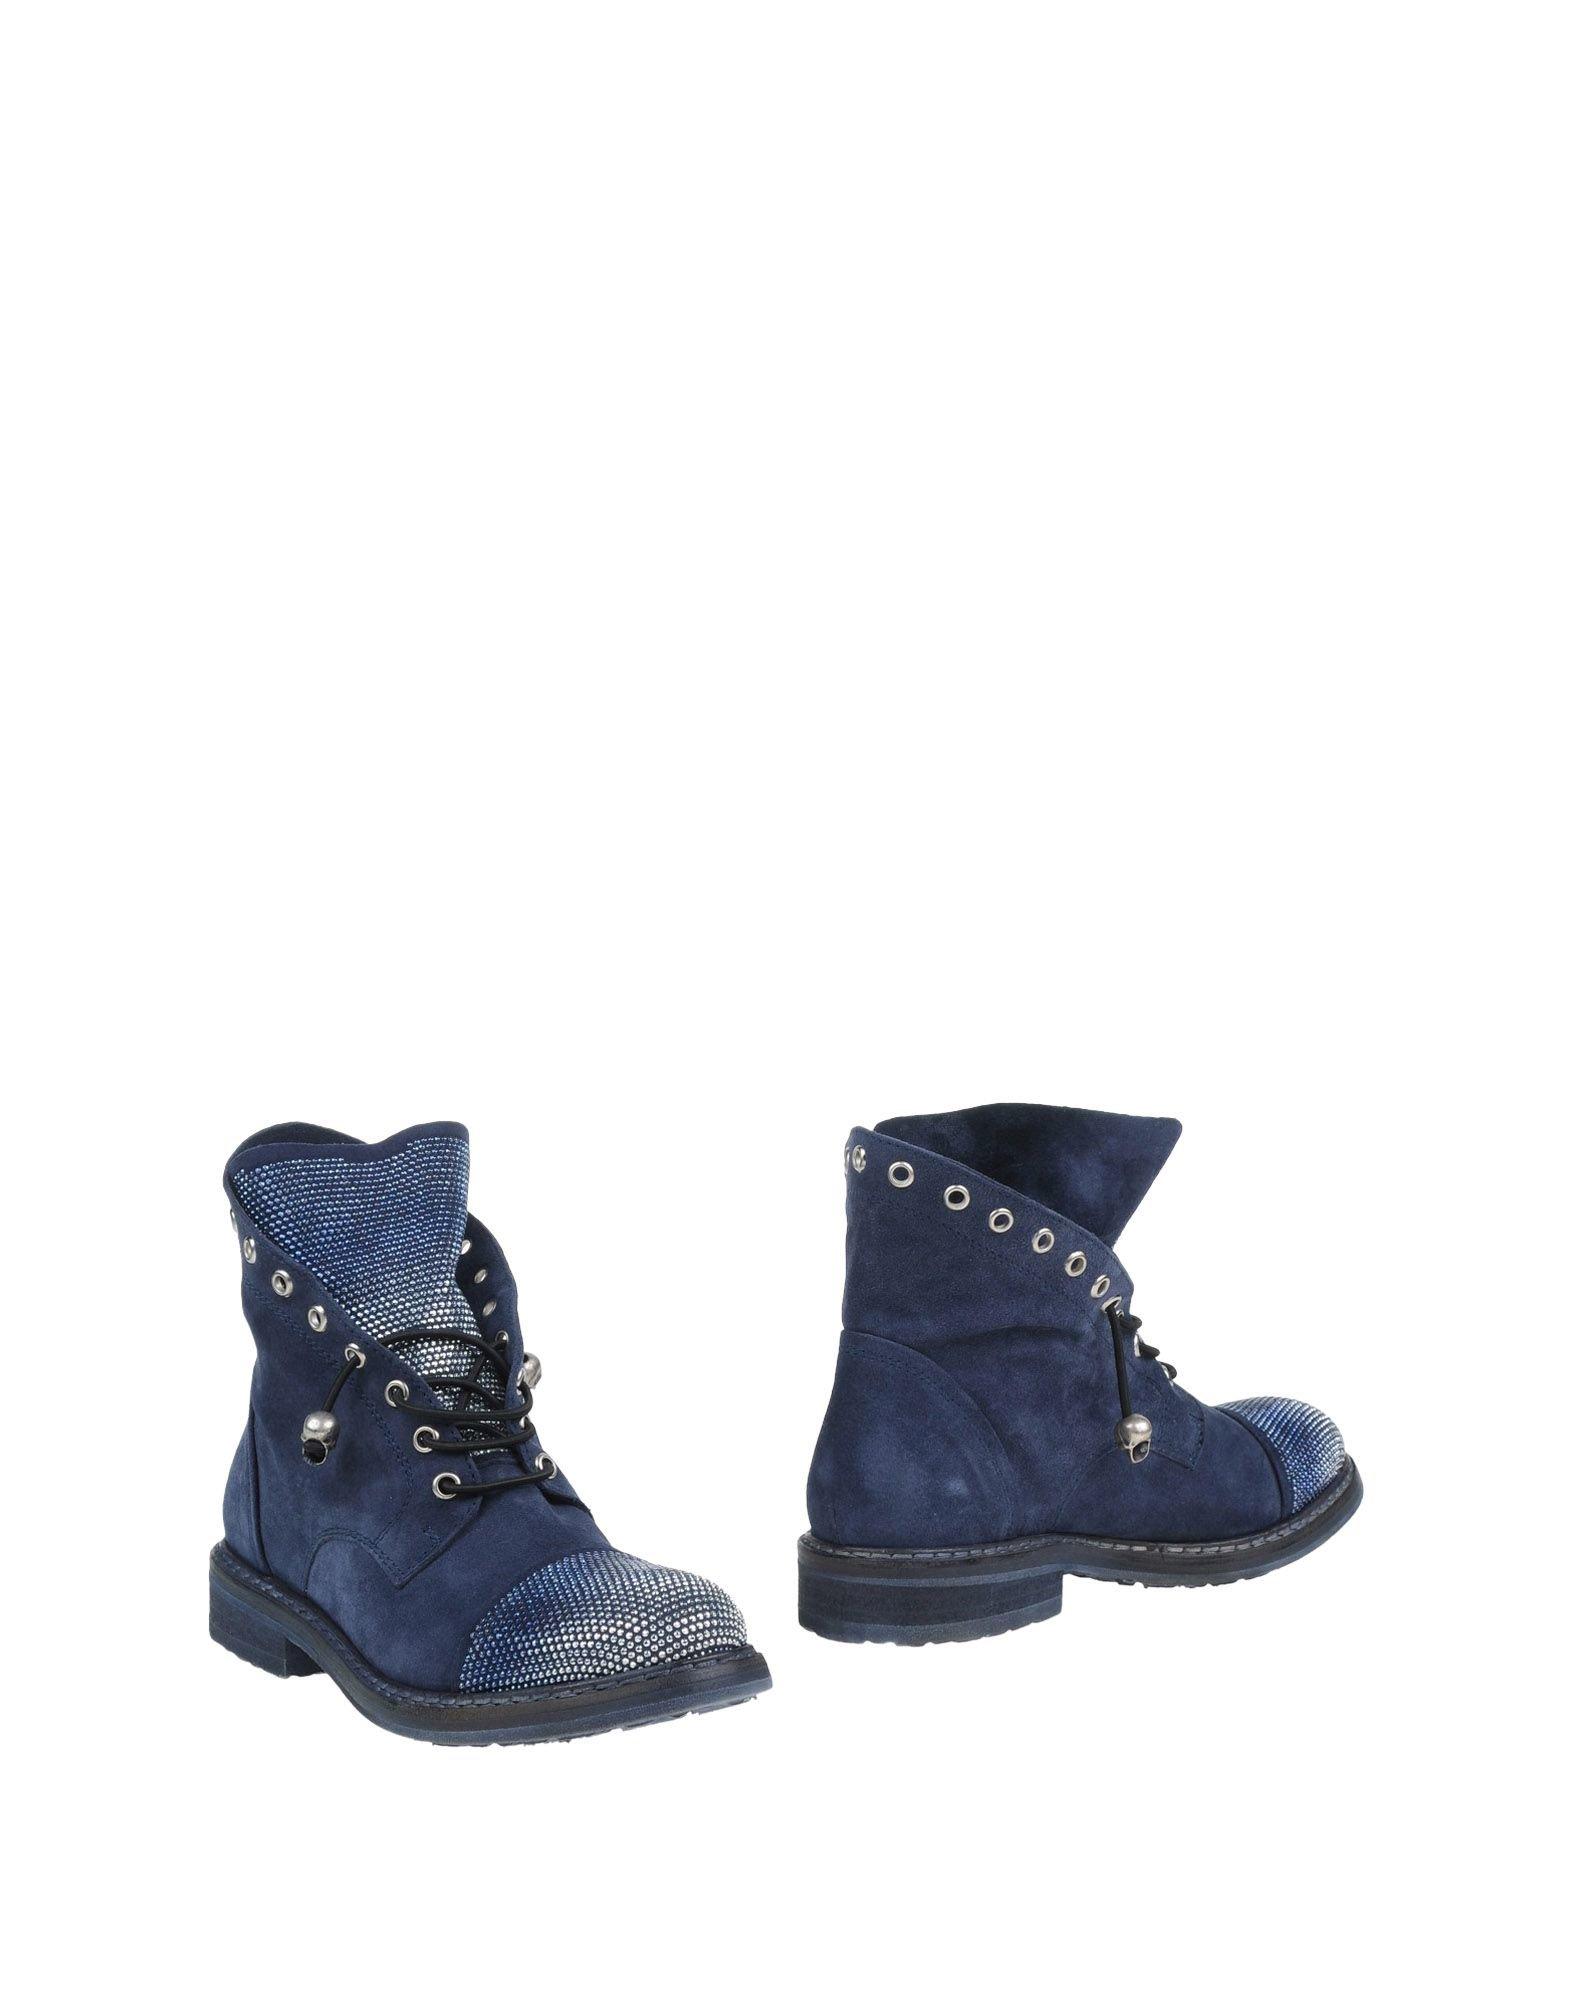 Fru It Ankle Boots In Pastel Blue Blue Lyst